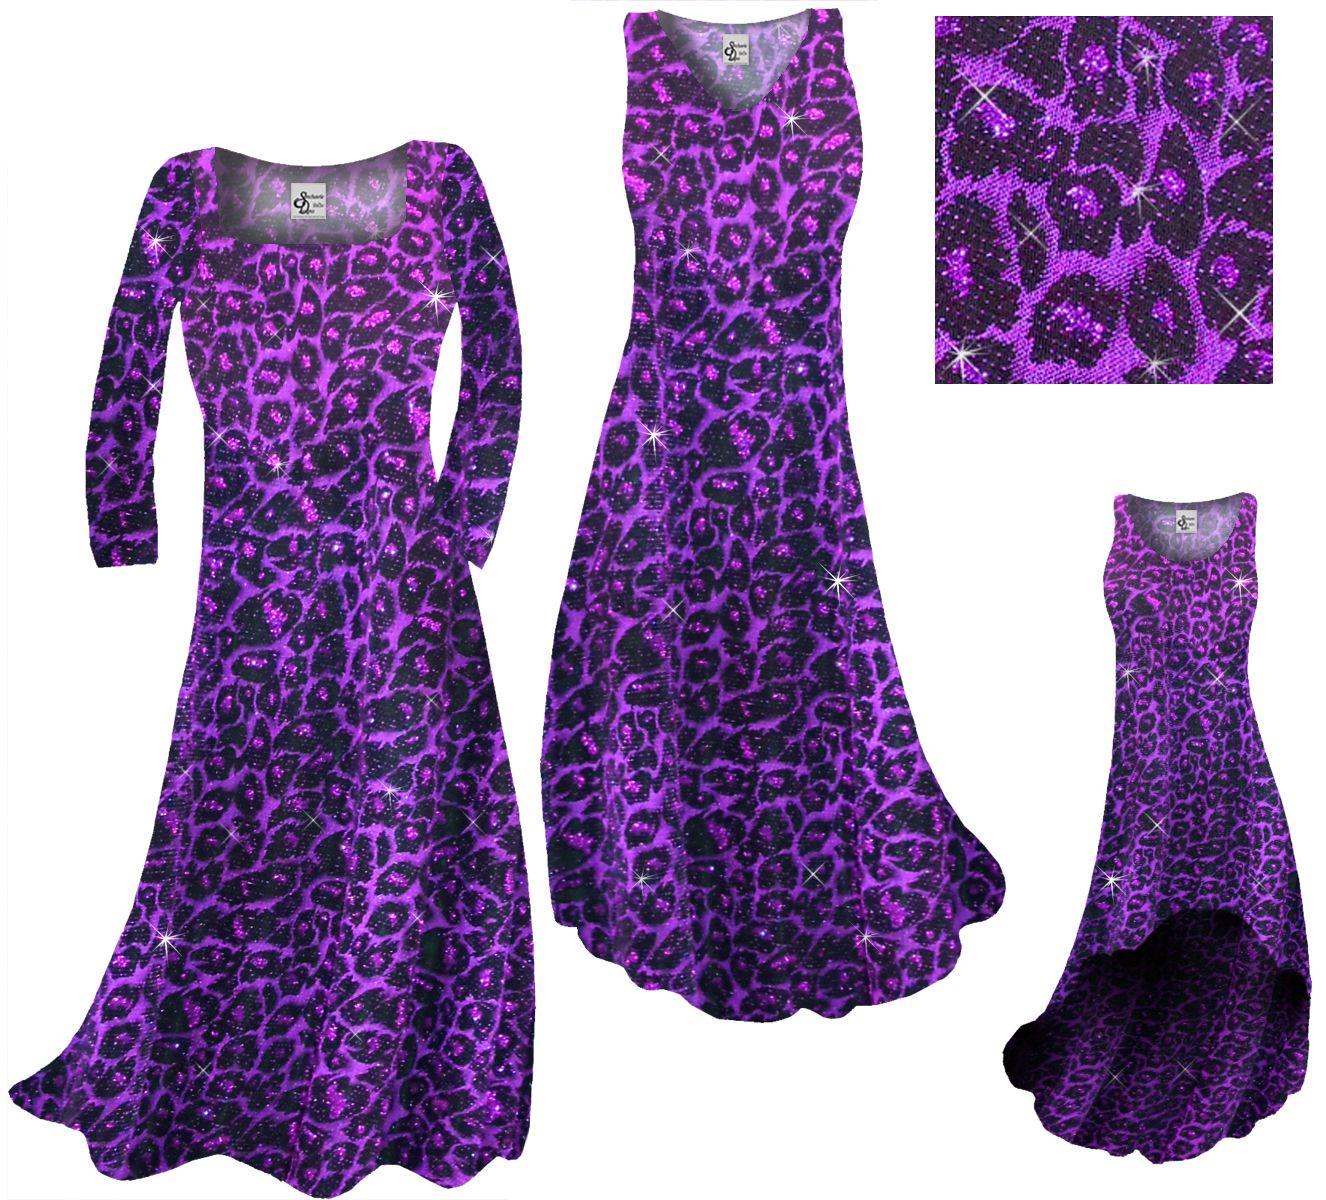 SALE! Customizable Purple Leopard Glittery Print Plus Size A-Line Dress 1x